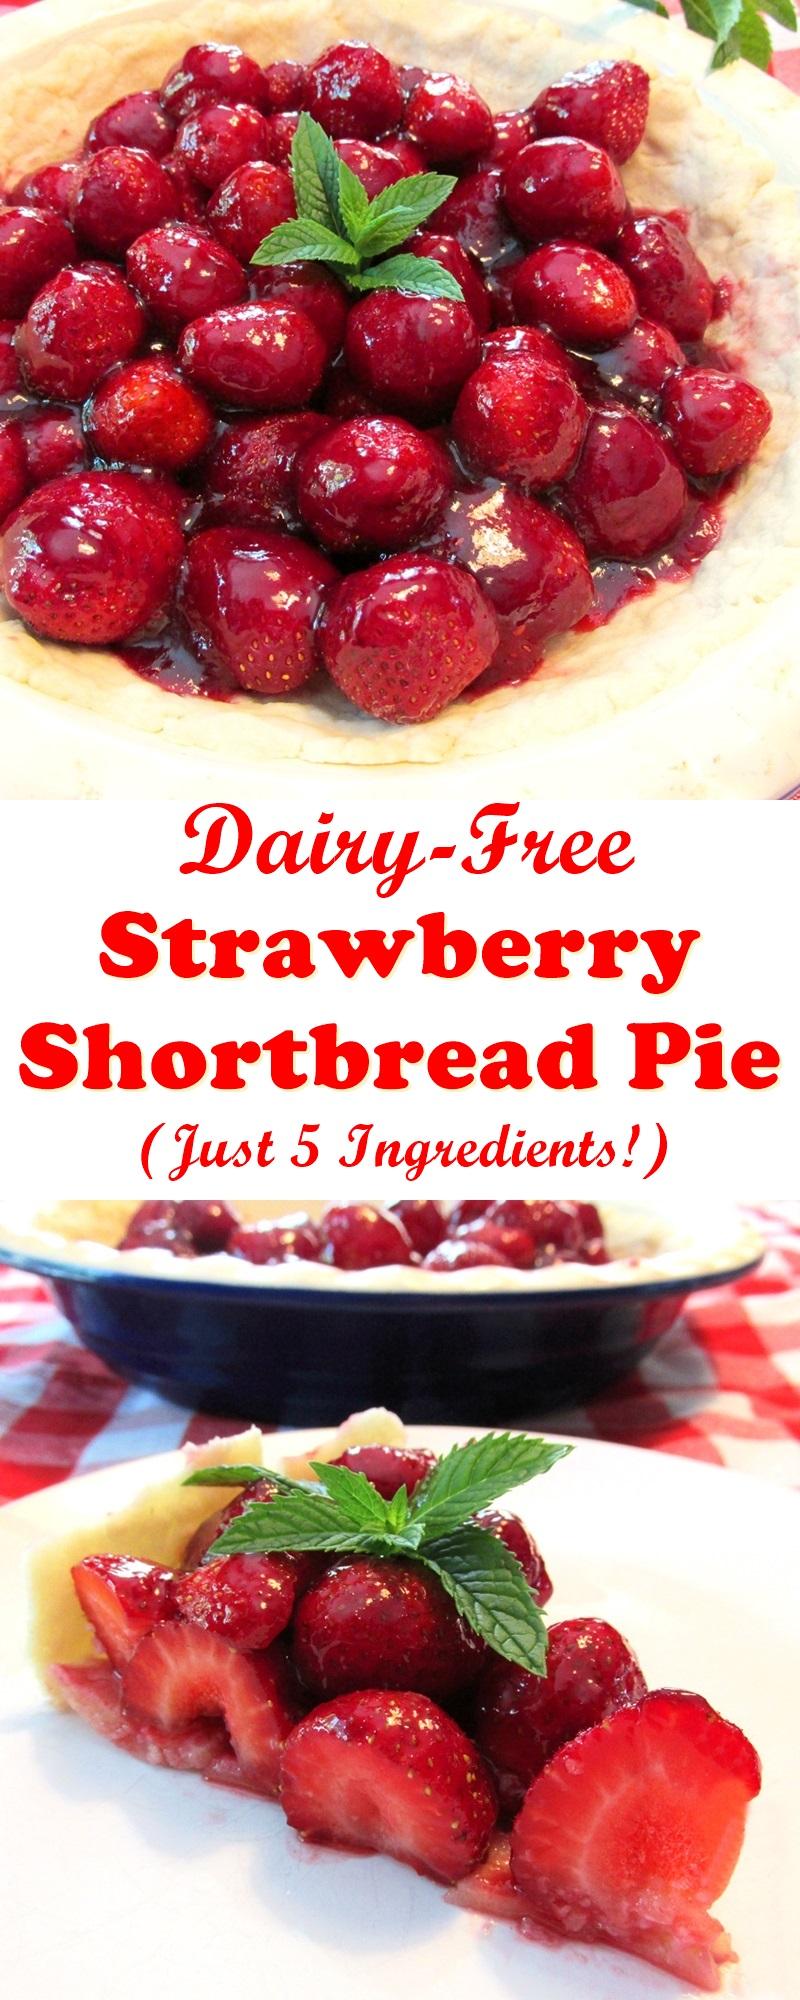 Strawberry Shortbread Pie Recipe (dairy-free, vegan, easy and just 5 ingredients!)